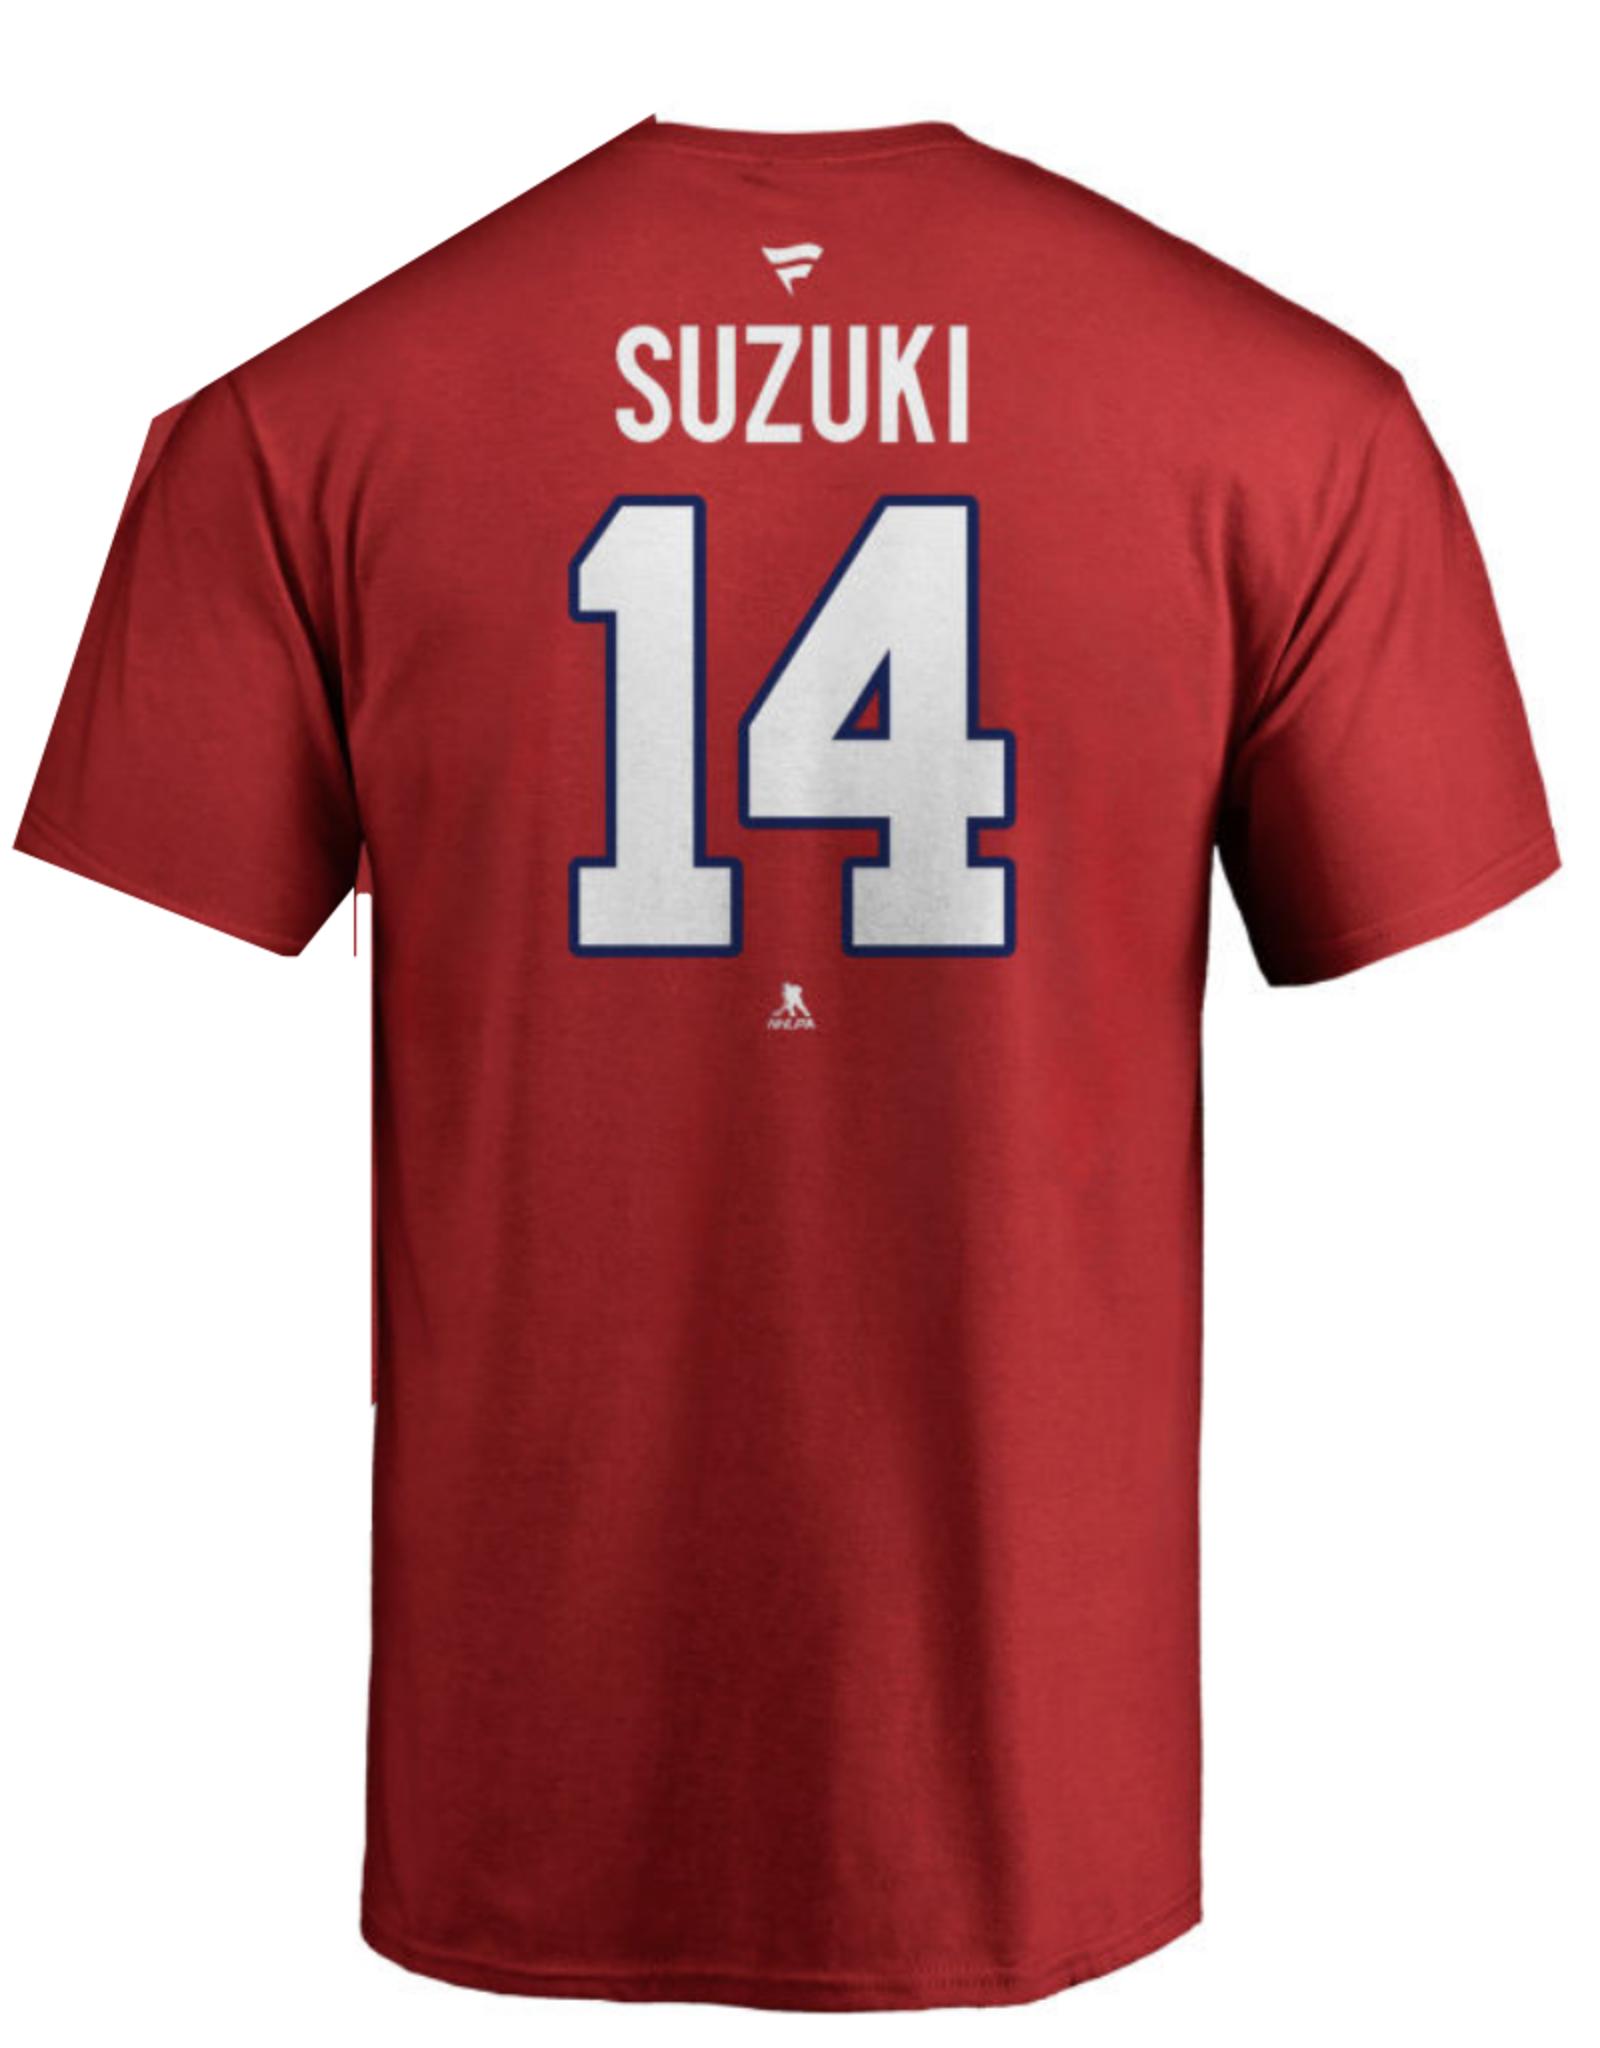 Fanatics Fanatics Men's Player T-Shirt Suzuki #14 Montreal Canadiens Red